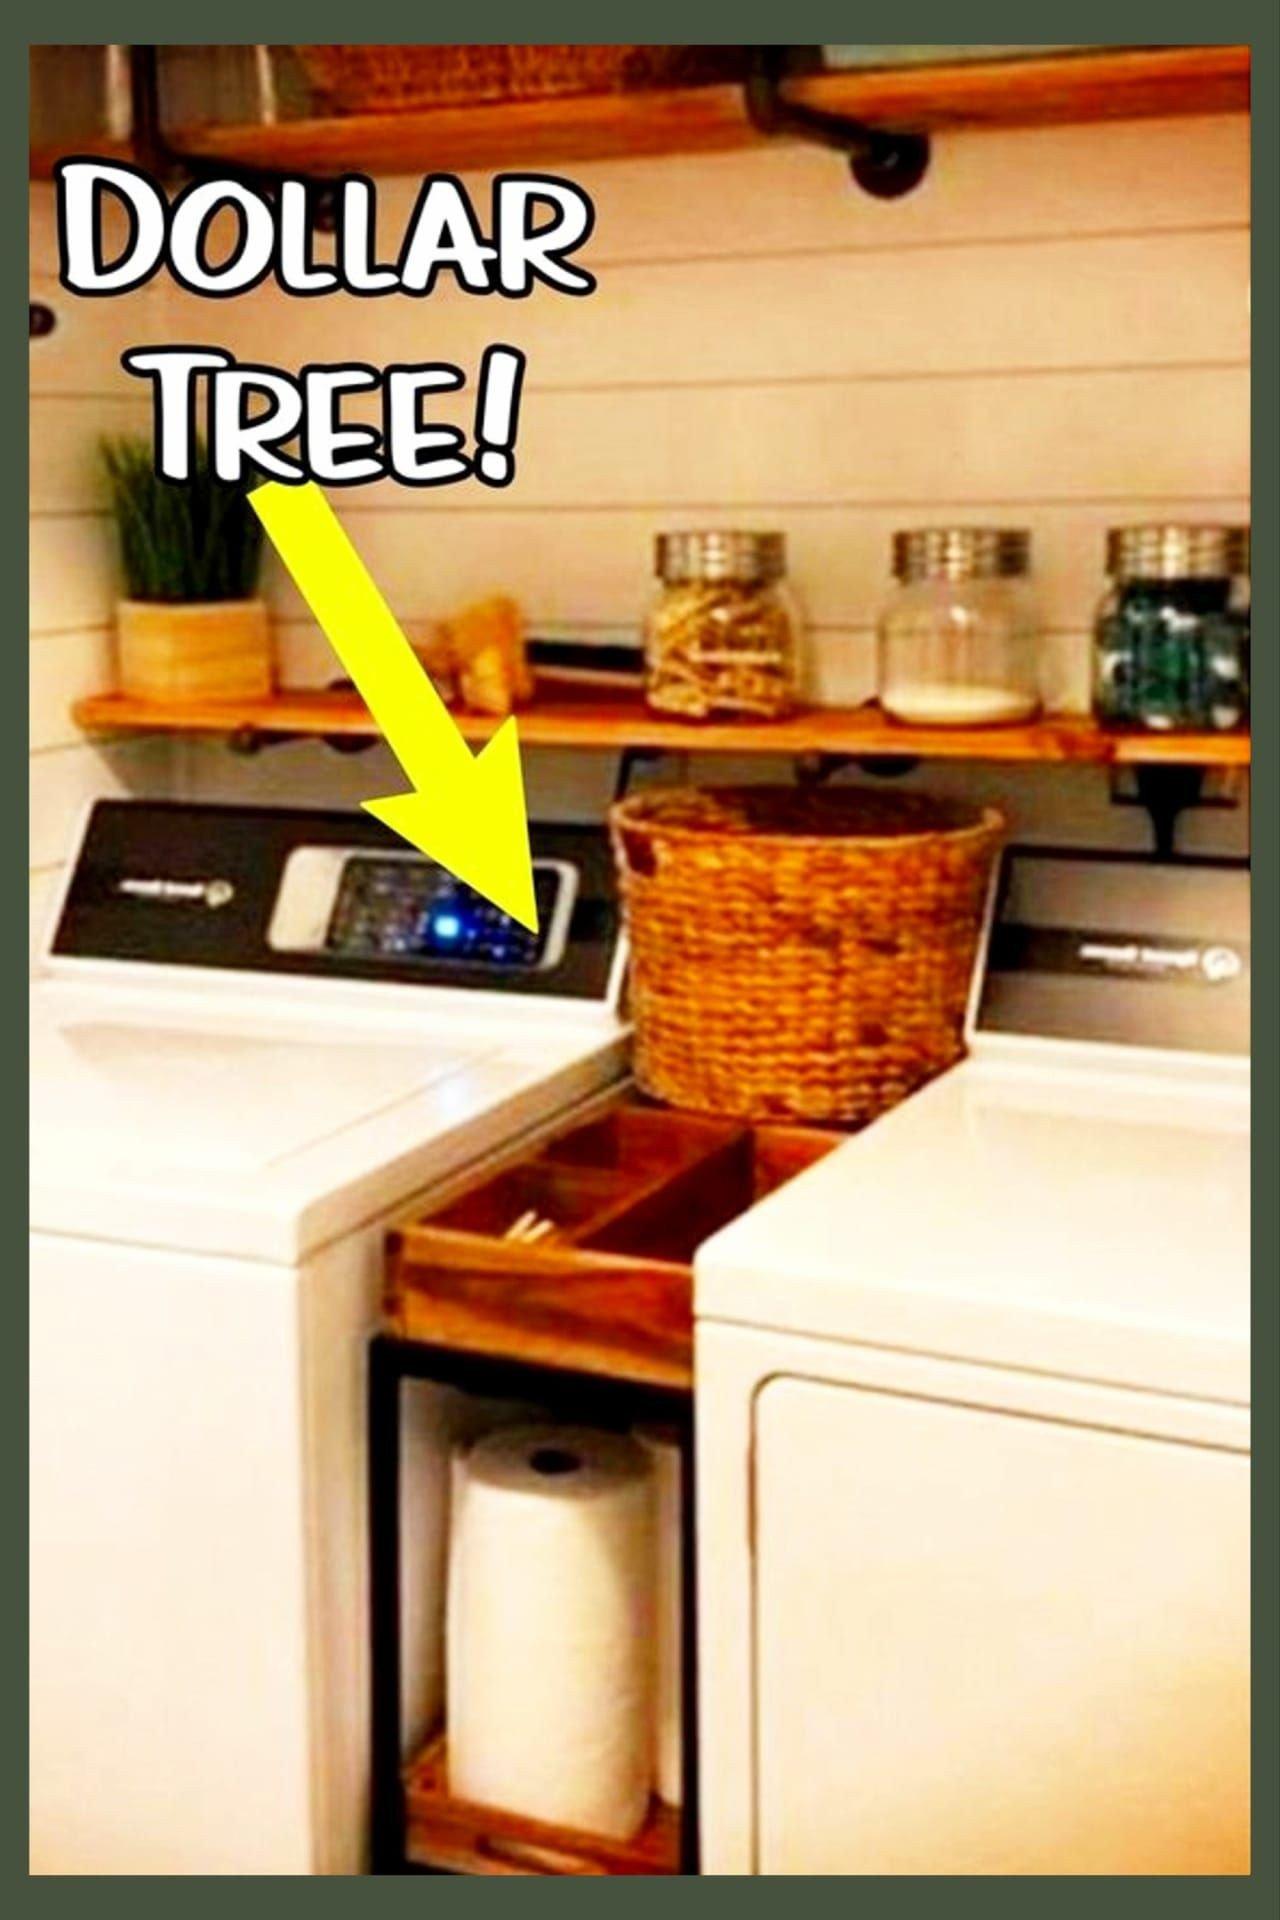 Small Bedroom Storage Ideas Fresh Small Laundry Room Ideas Space Saving Ideas for Tiny